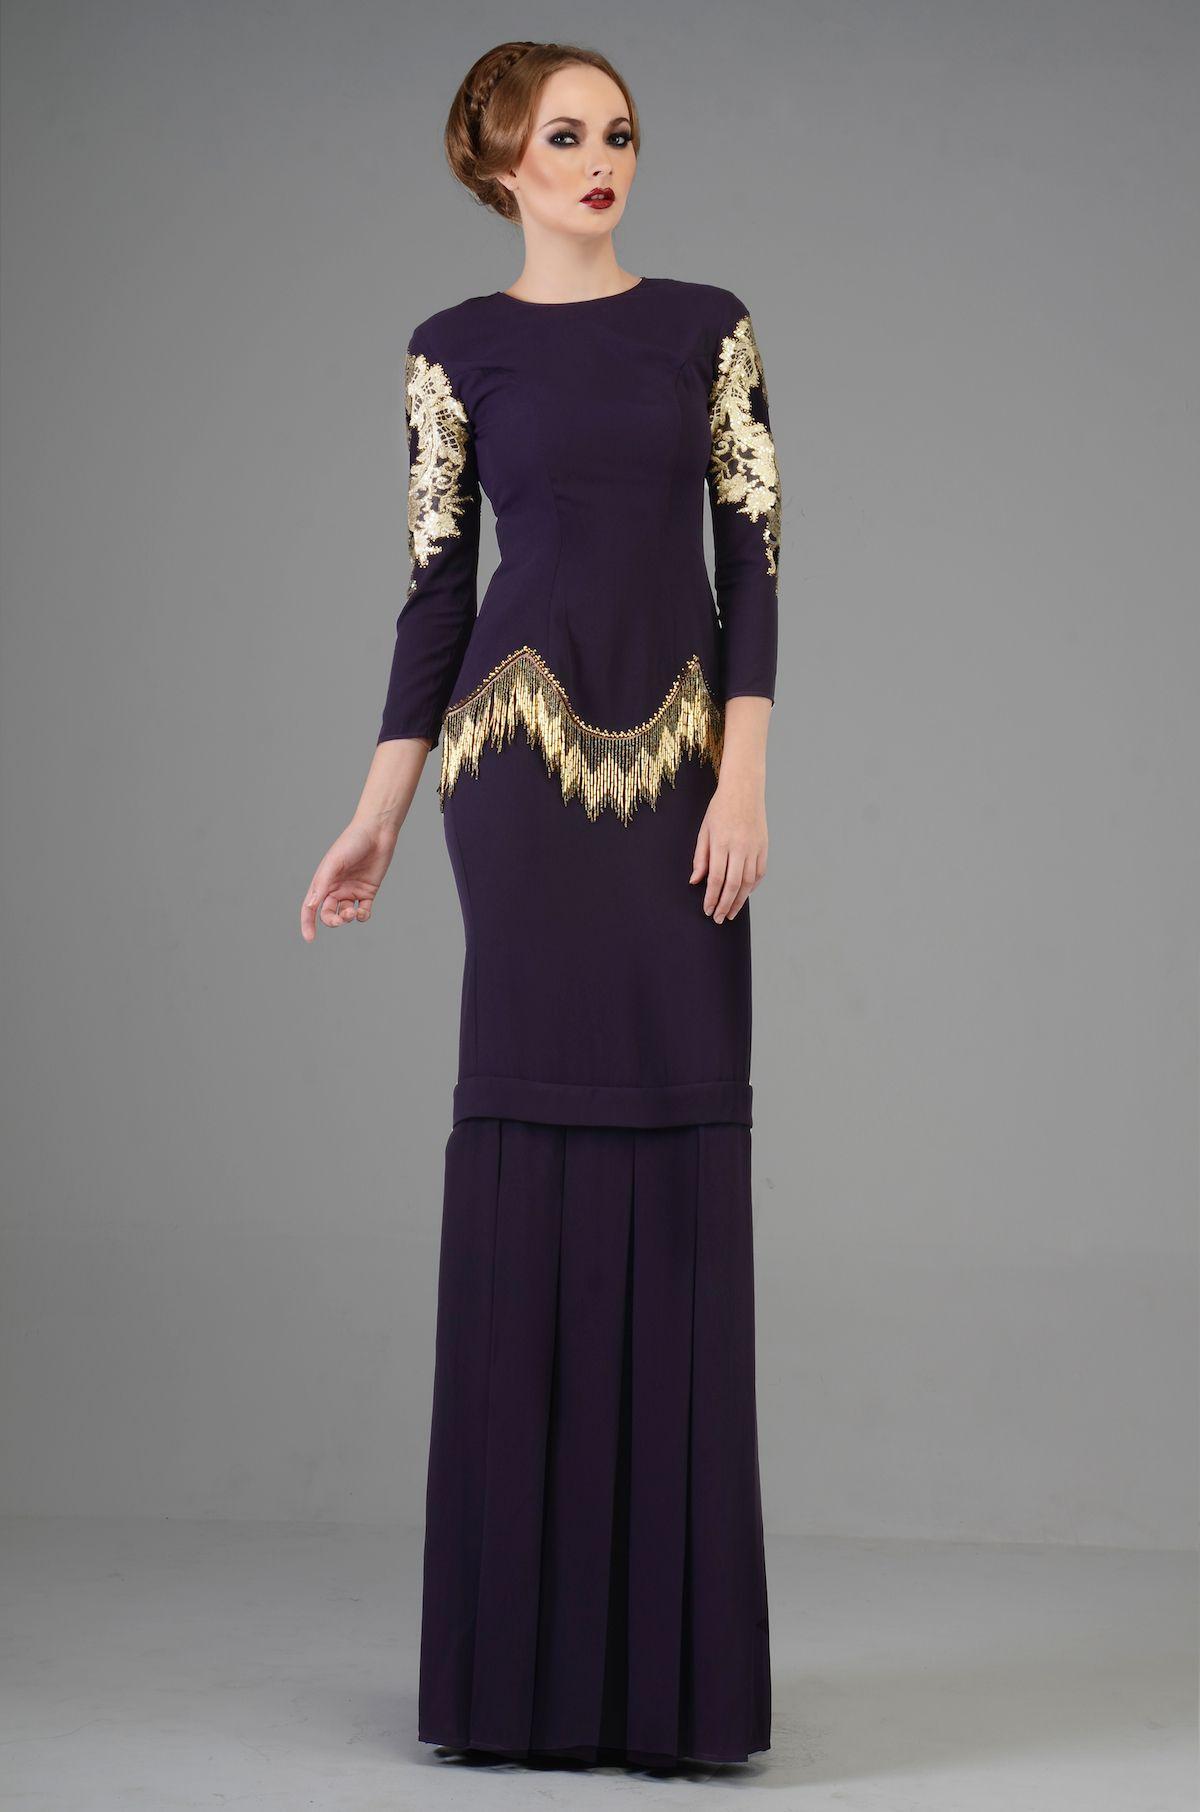 Rafiecca Radzi: RizmanRuzainis New Boutique